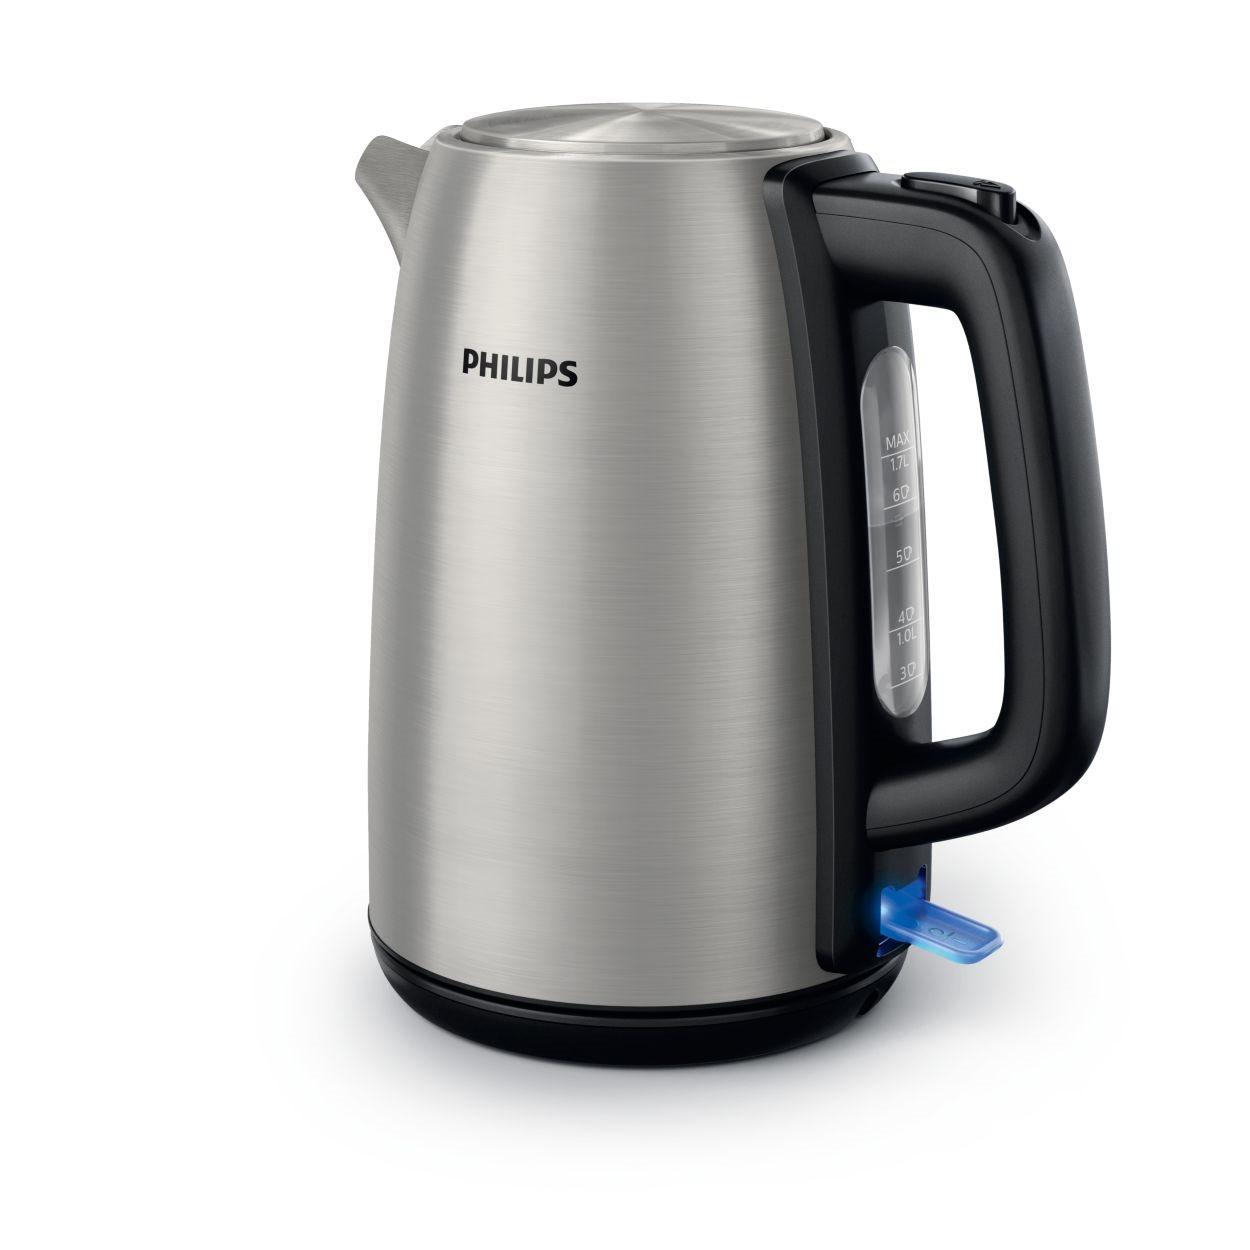 Philips Βραστήρας 1.7lt 2200W HD9351/91 Inox